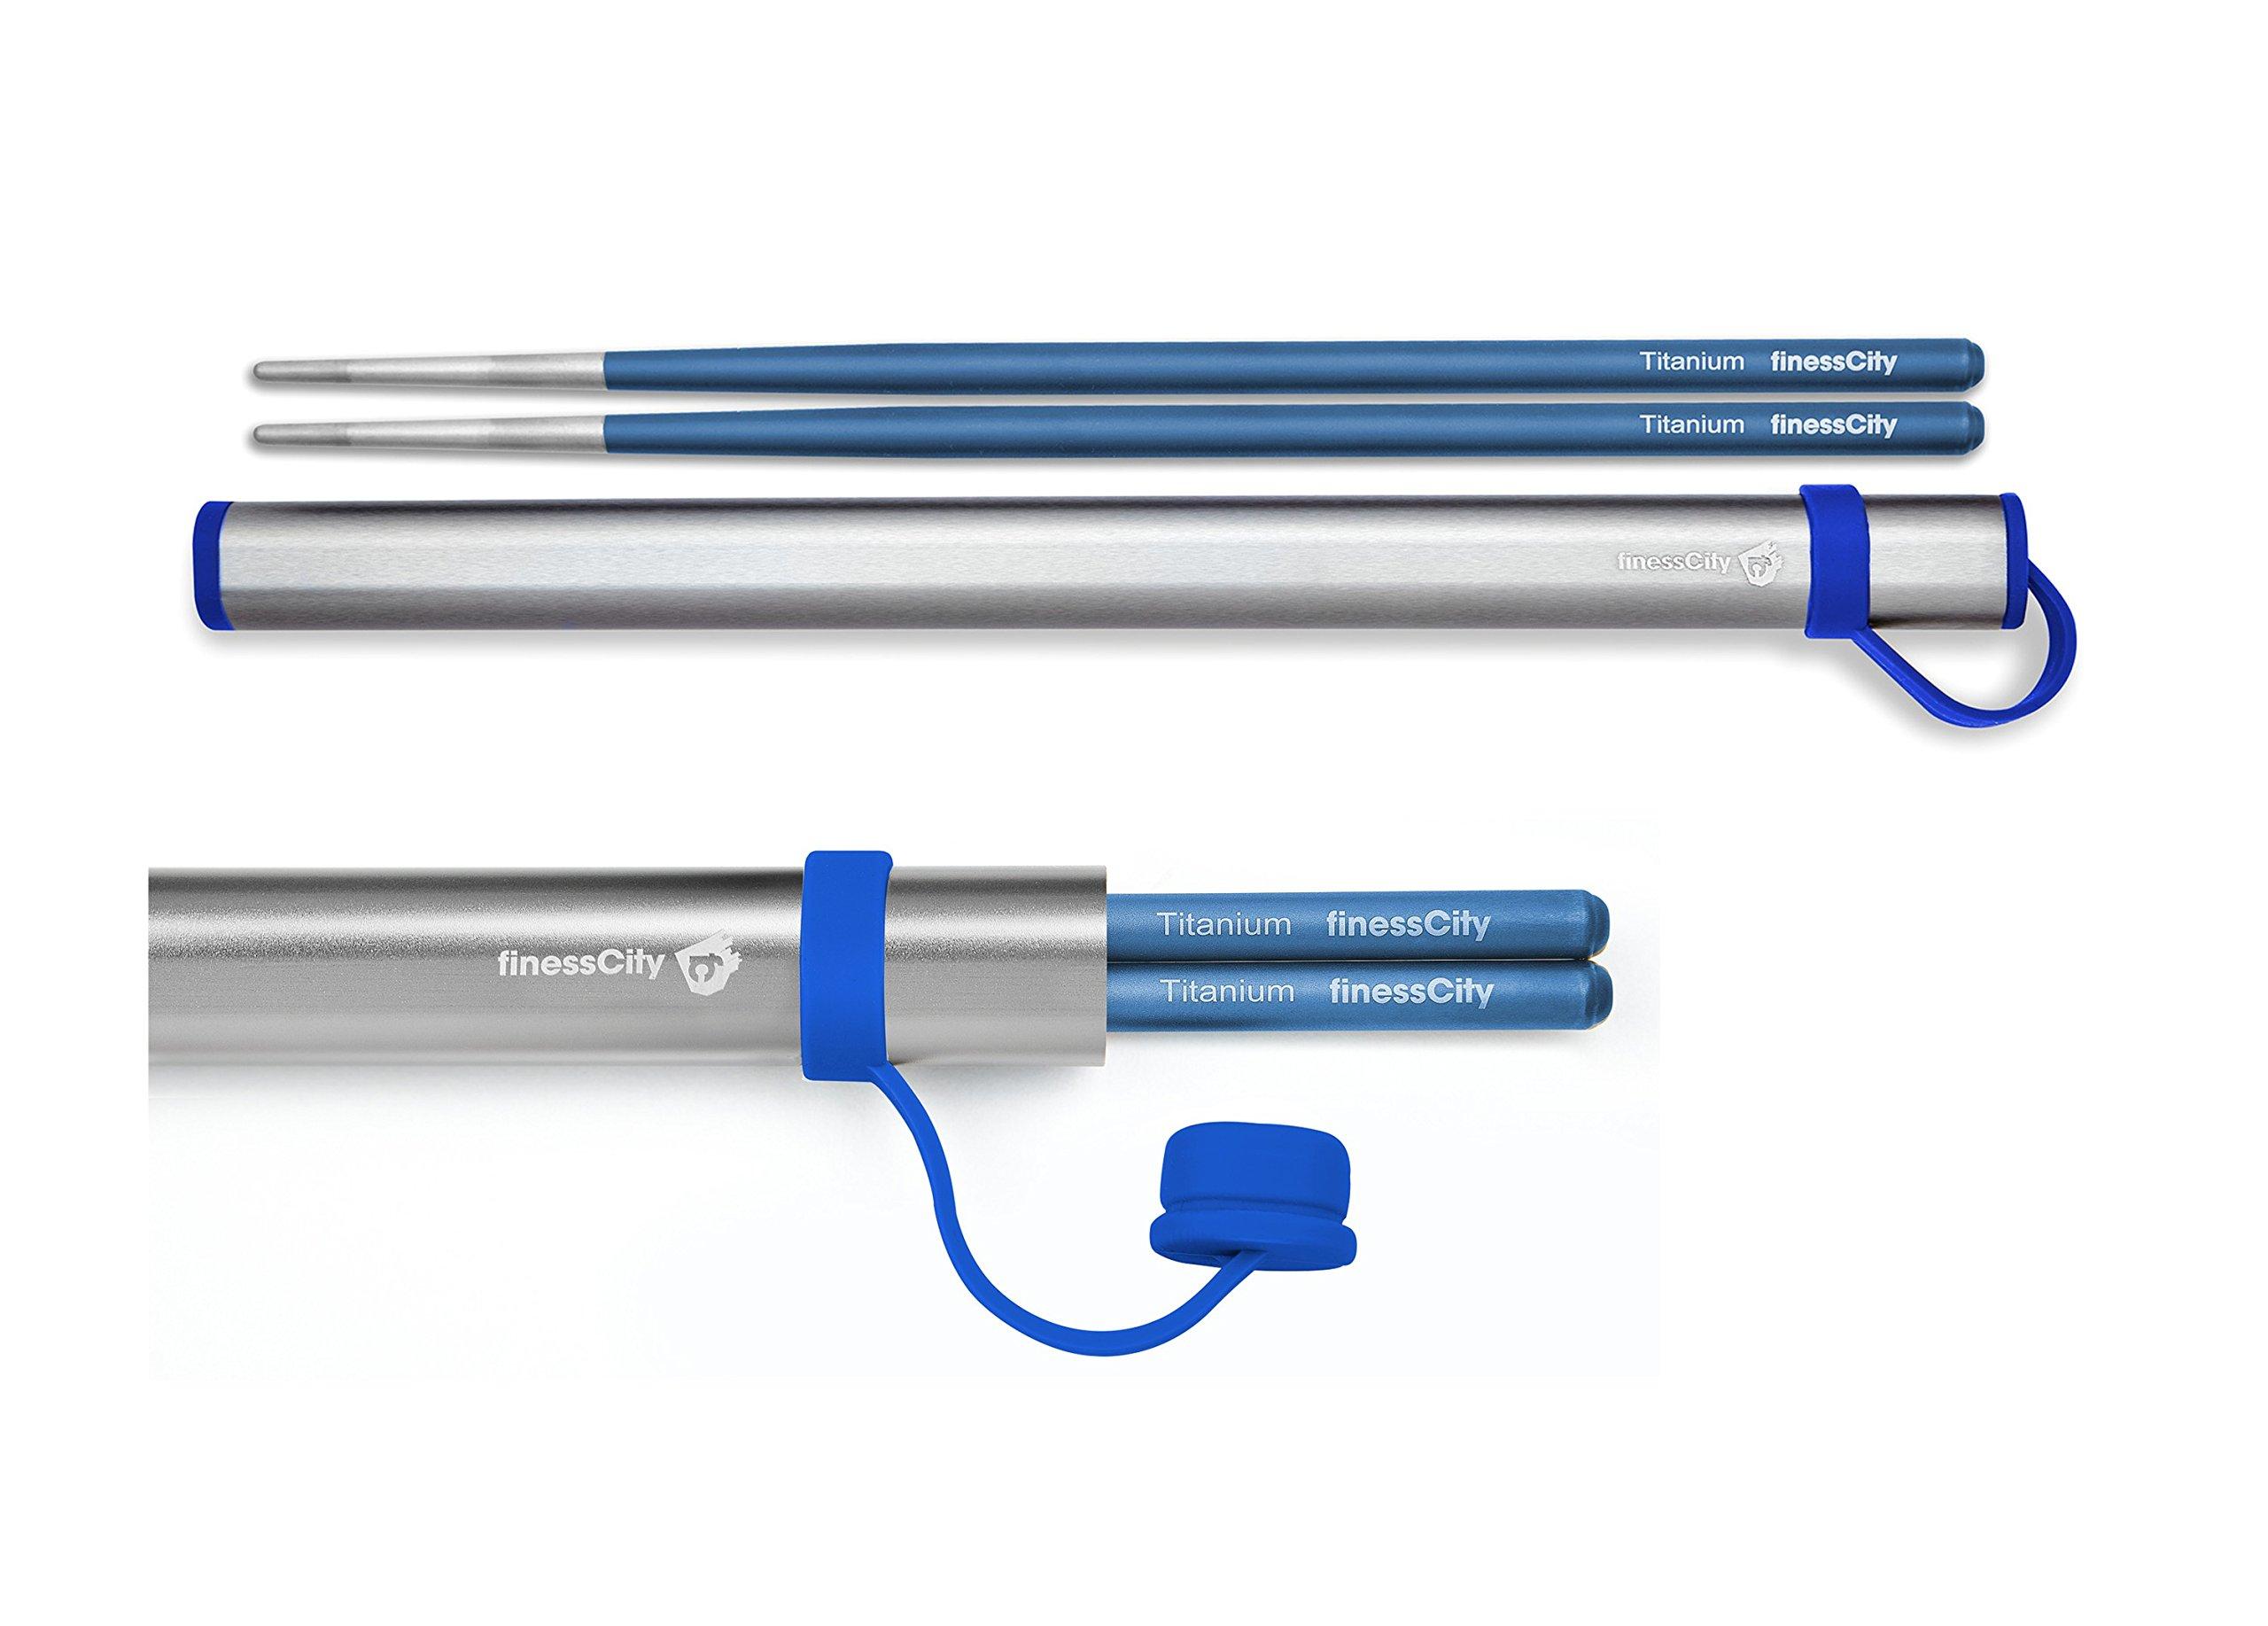 Chopsticks, 1 Pair of Titanium Chopsticks Ultra Lightweight Professional (Ti), Super Strong Healthy and Eco-Friendly 1 Pair of Chopsticks Comes with Free Aluminium Case (Blue)